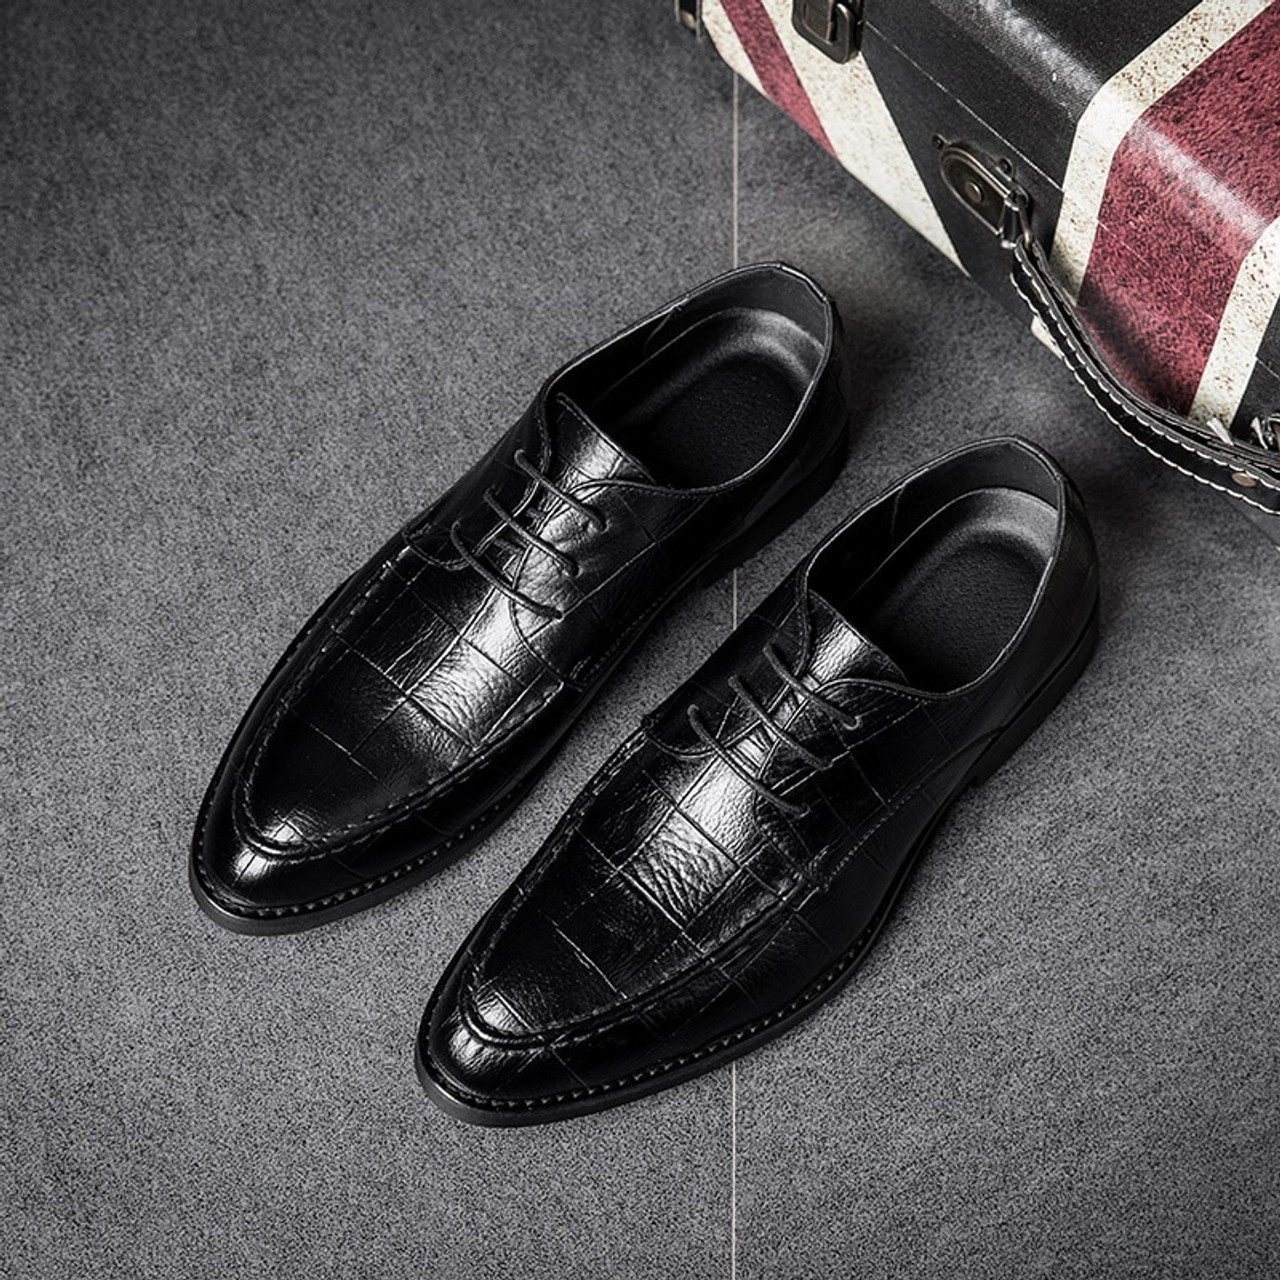 5f30c8b2137 2018 Ltalian Luxury Designer Formal Mens Dress Shoes Genuine Leather Black  Basic Flats For Men Wedding ...